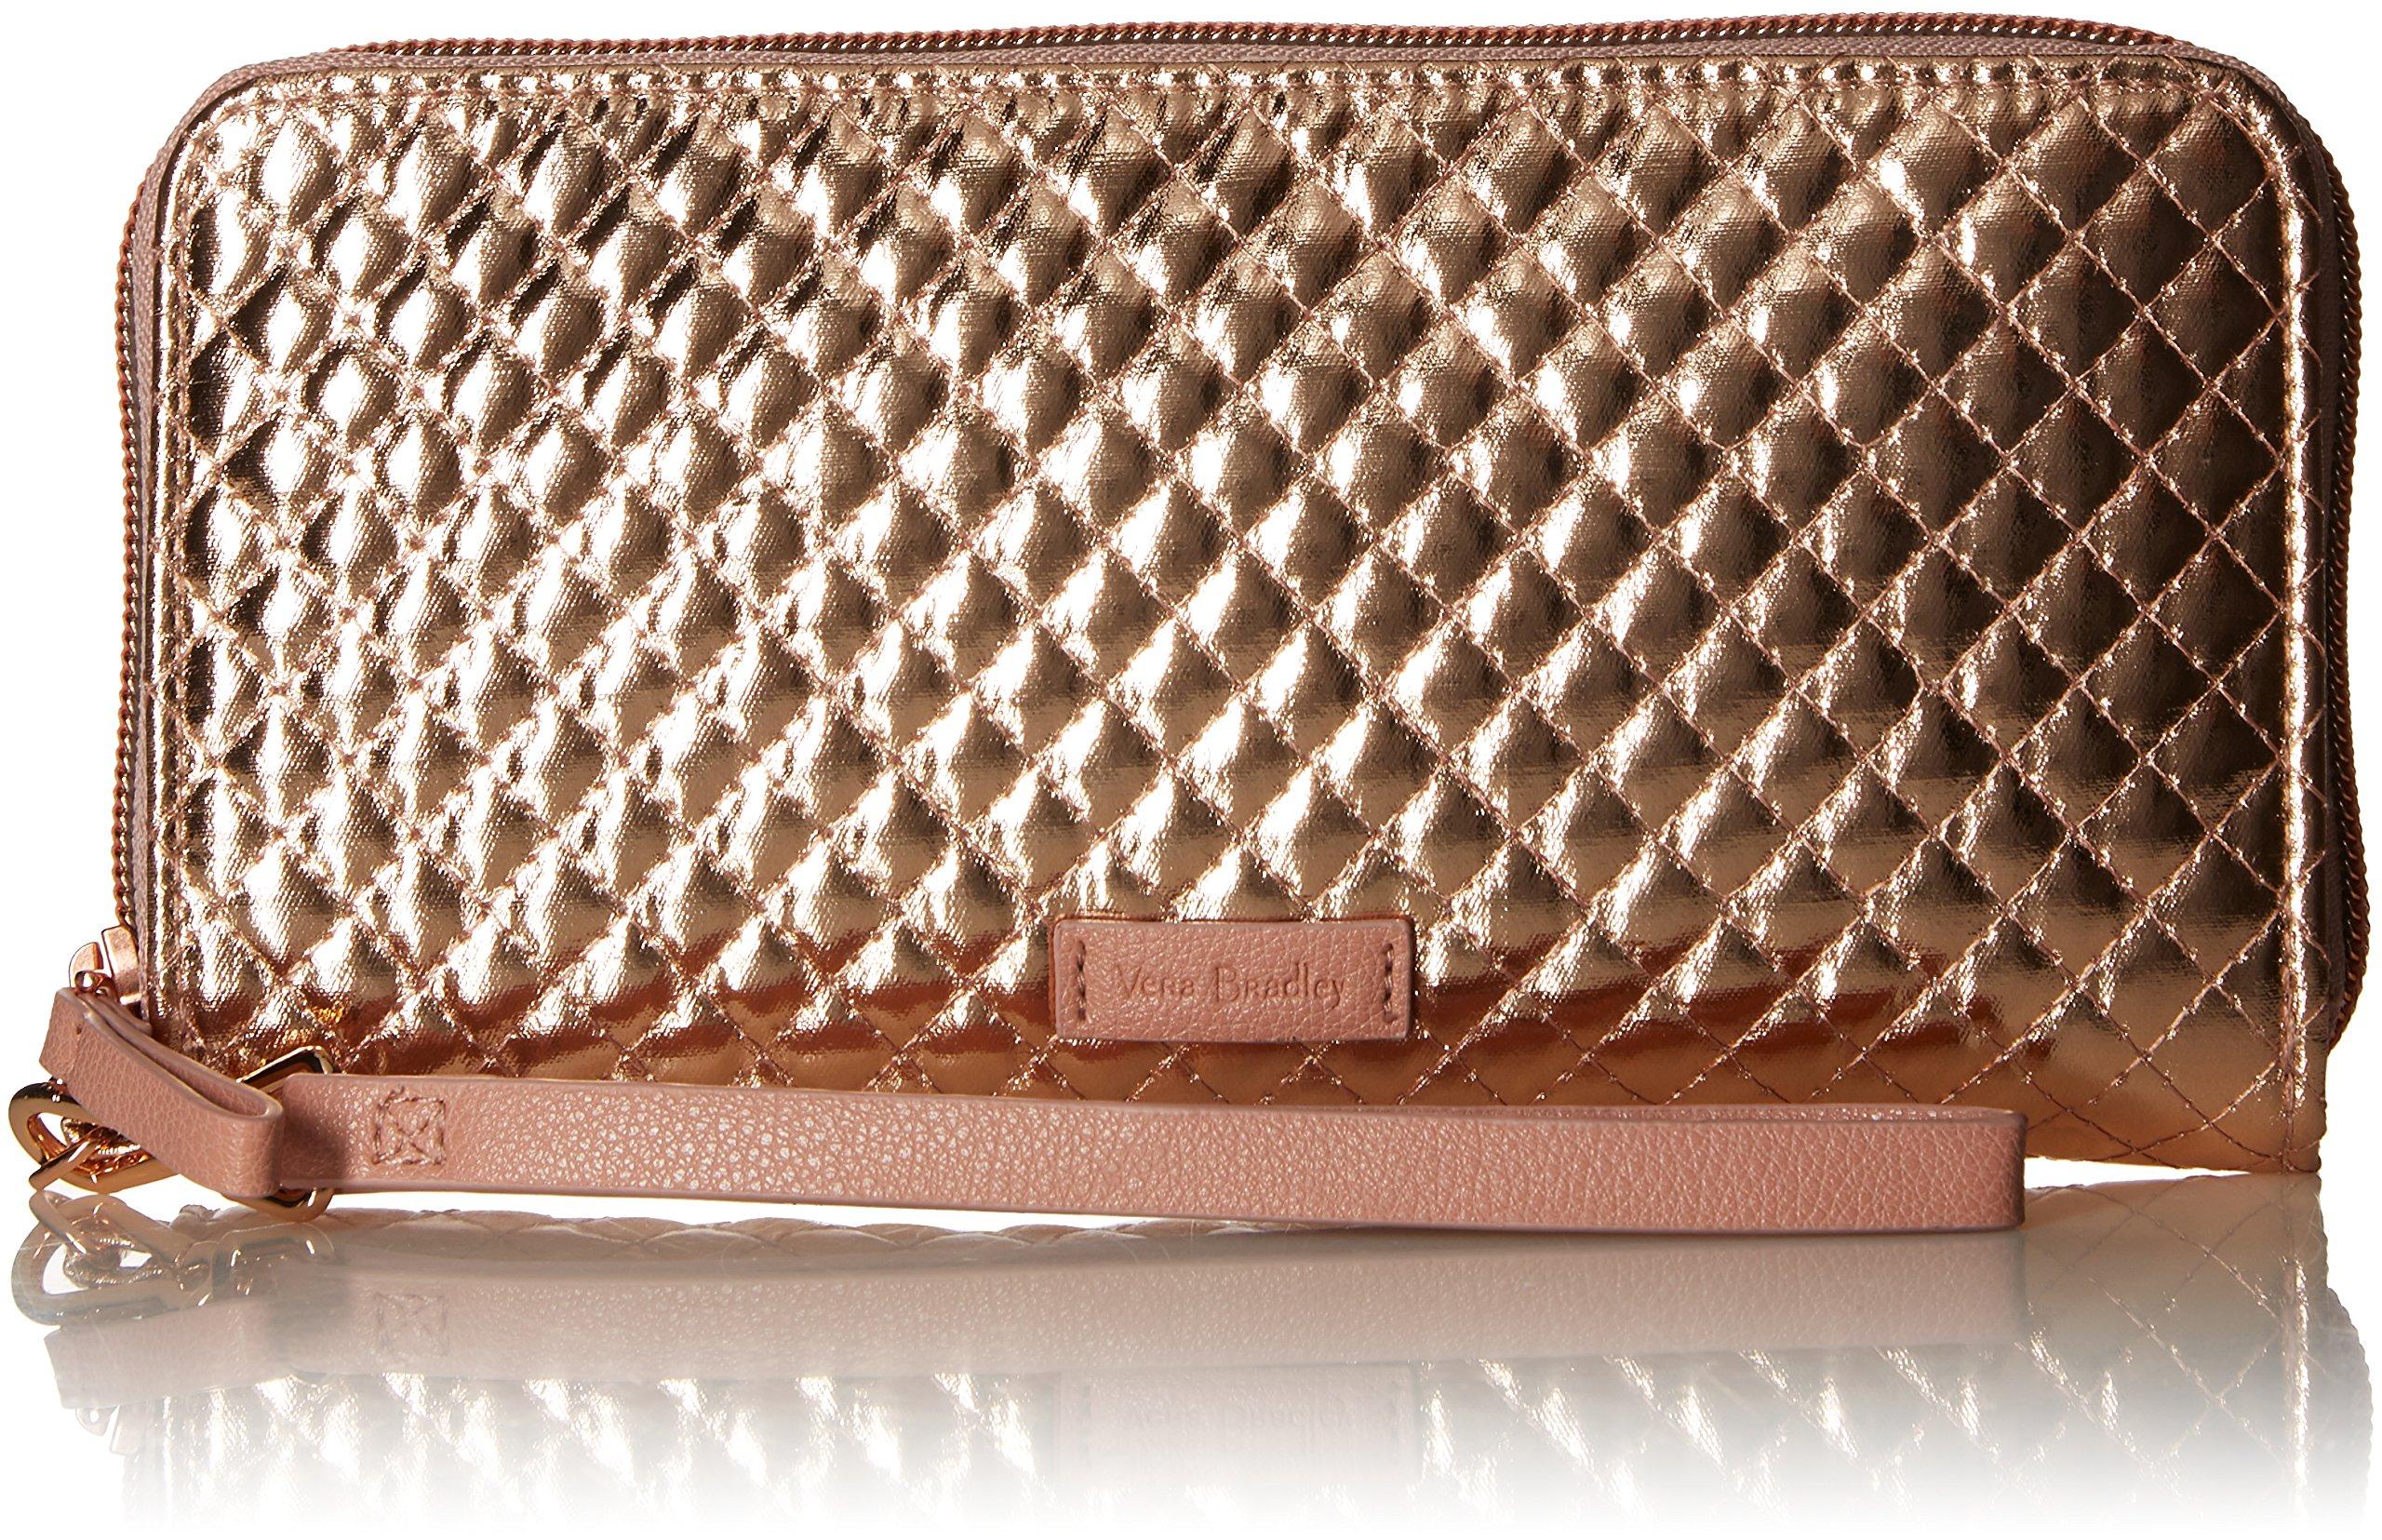 Vera Bradley Iconic Rfid Accordion Wristlet, Foiled Cotton, Rose Gold Shimmer